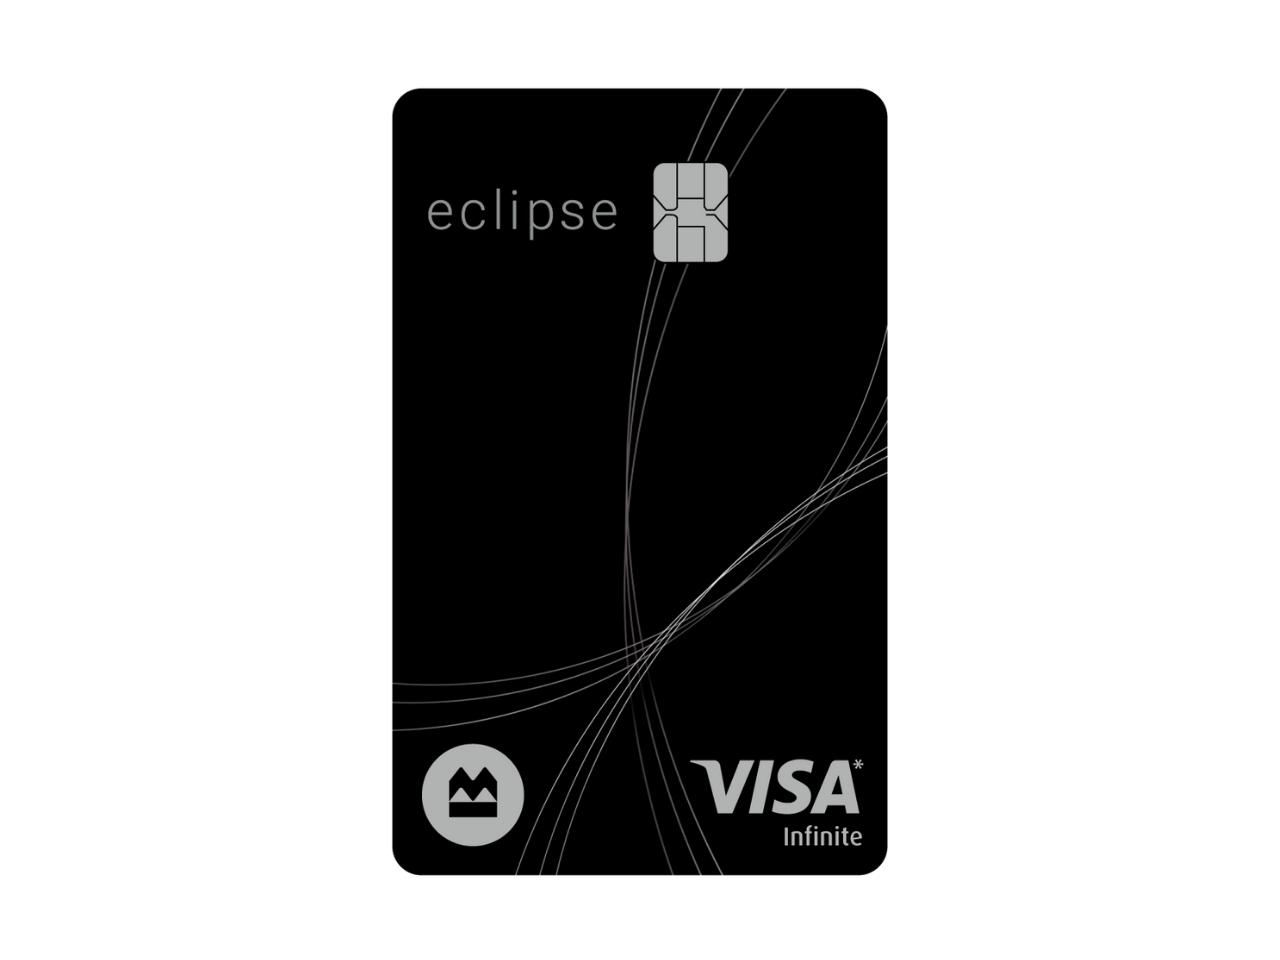 BMO eclipse Visa Infinite* Card Review